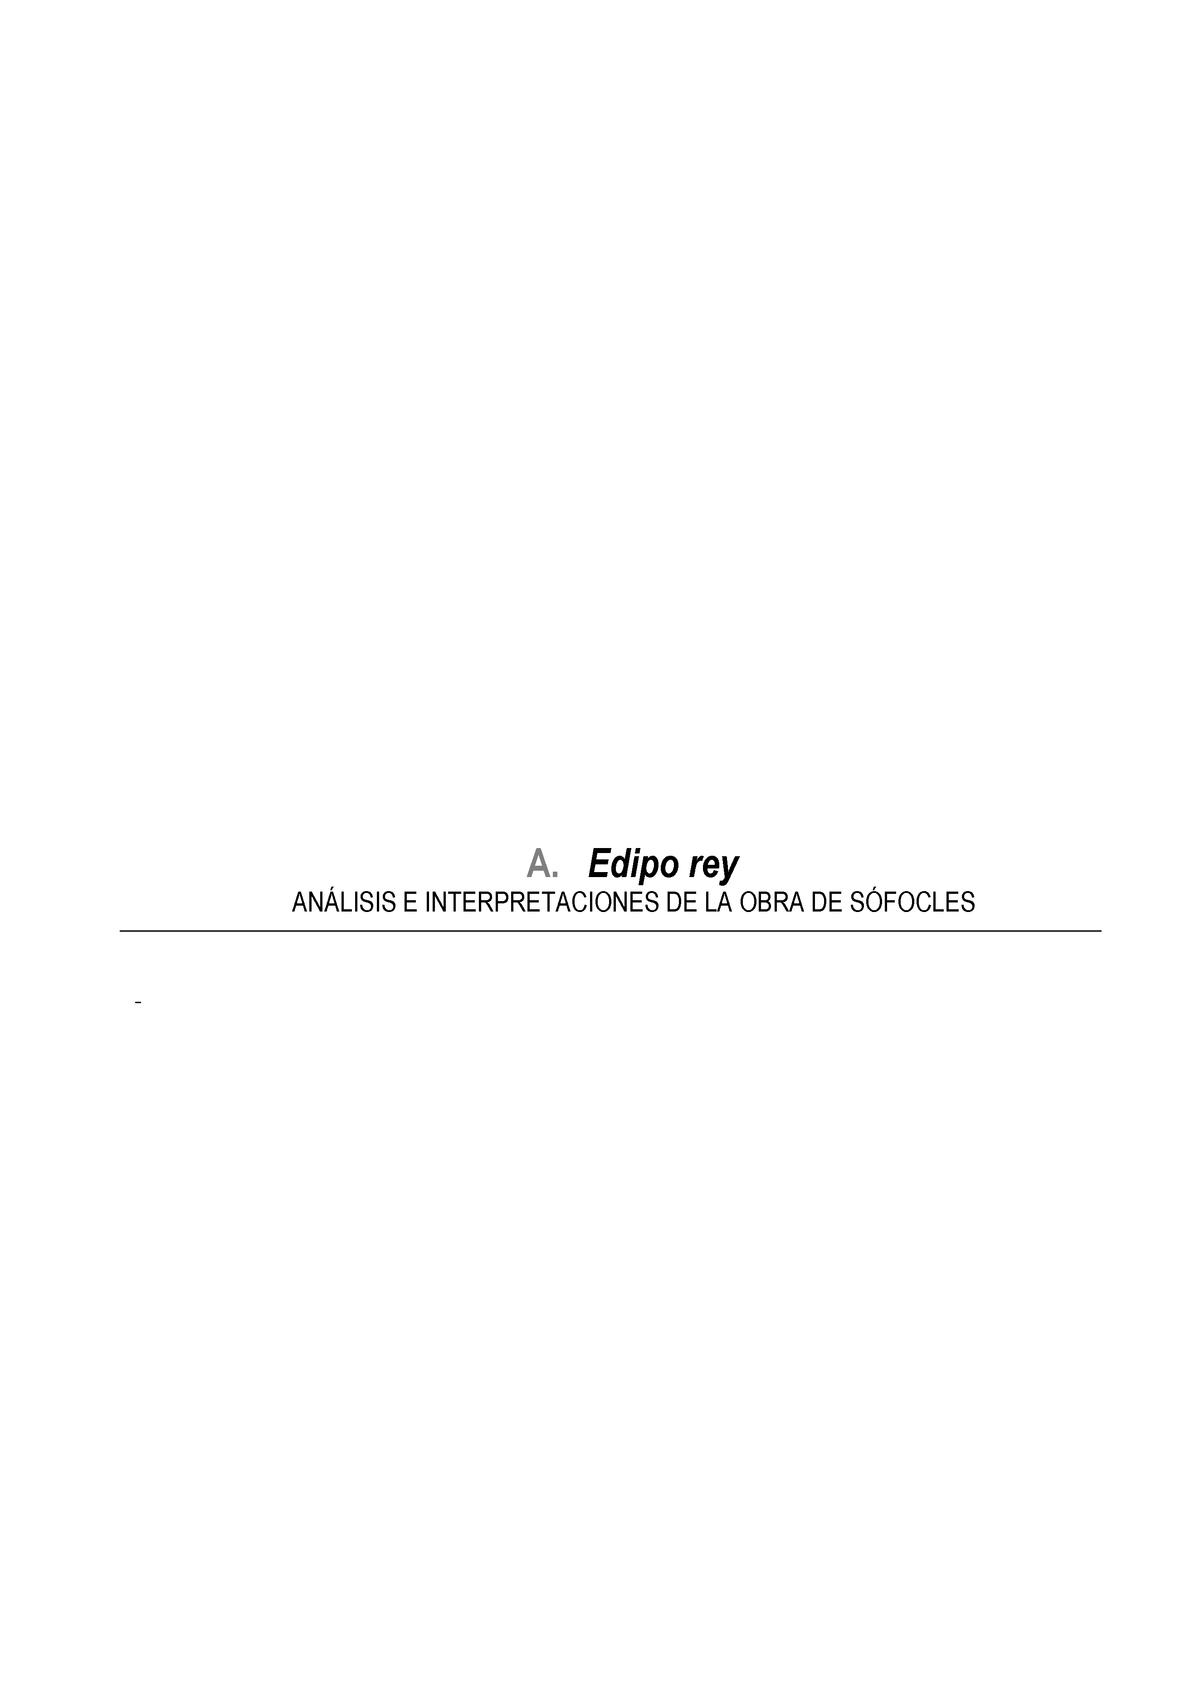 Análisis De La Obra De Sófocles Edipo Rey Estética 107618